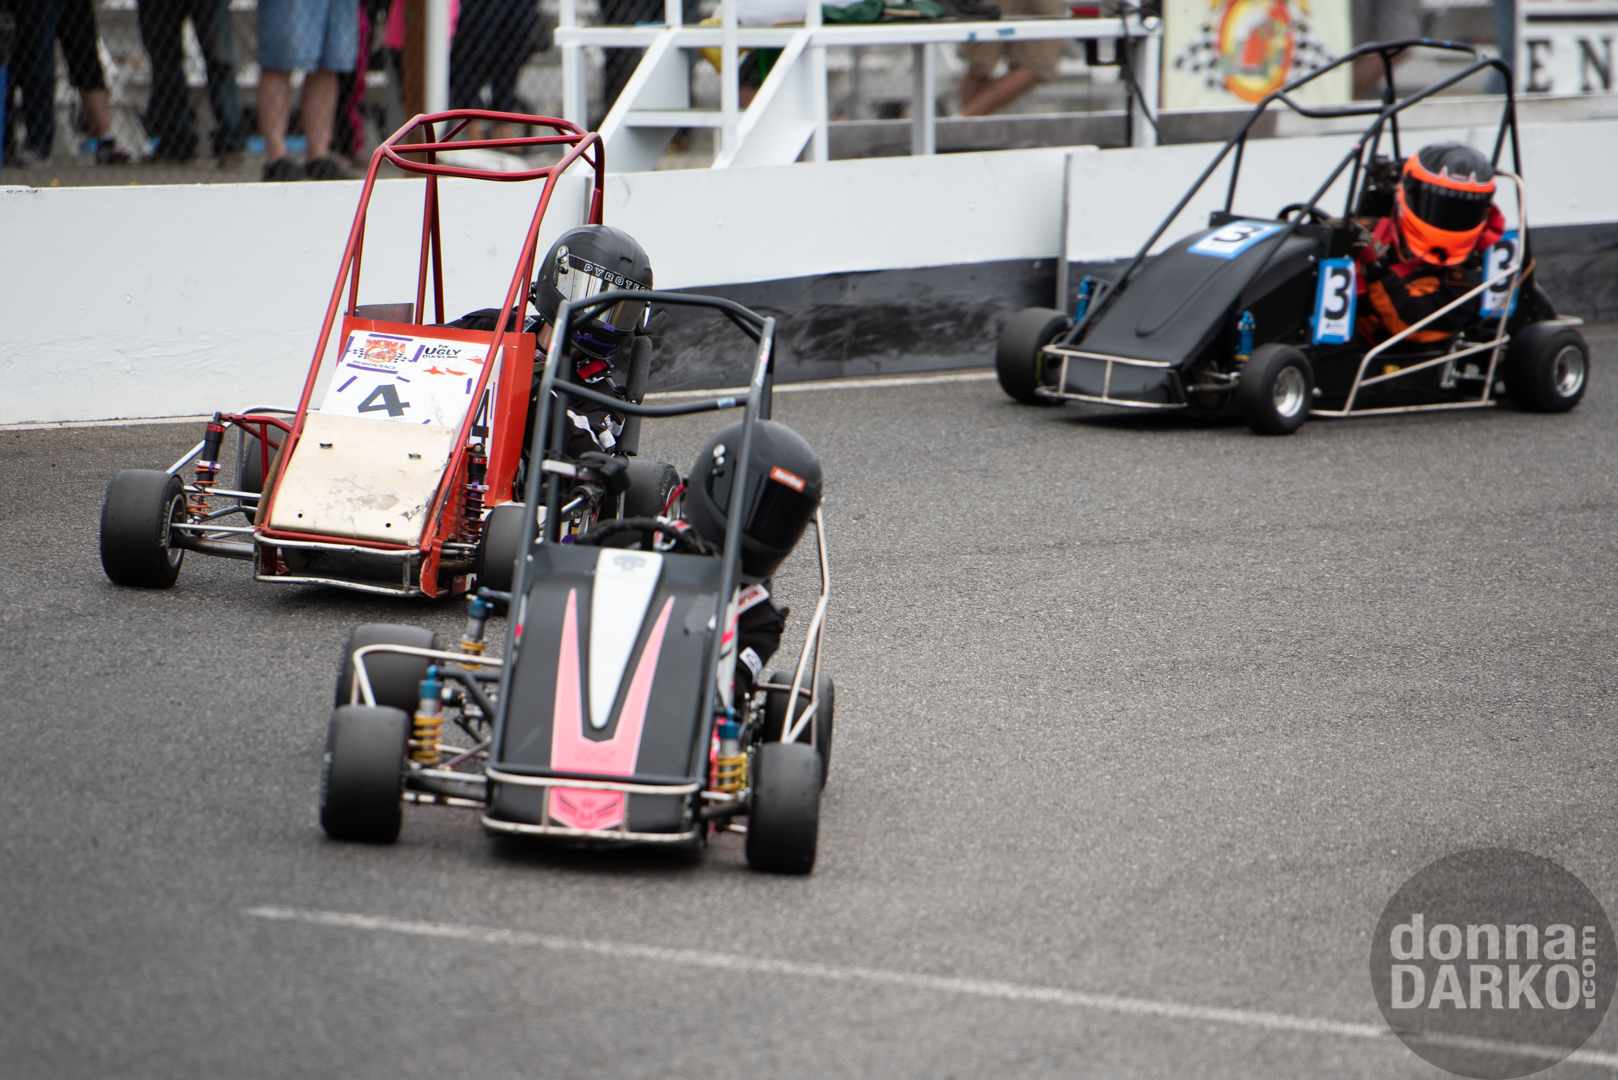 QWMA (Racing) 8-11-2019 DSC_6543.jpg